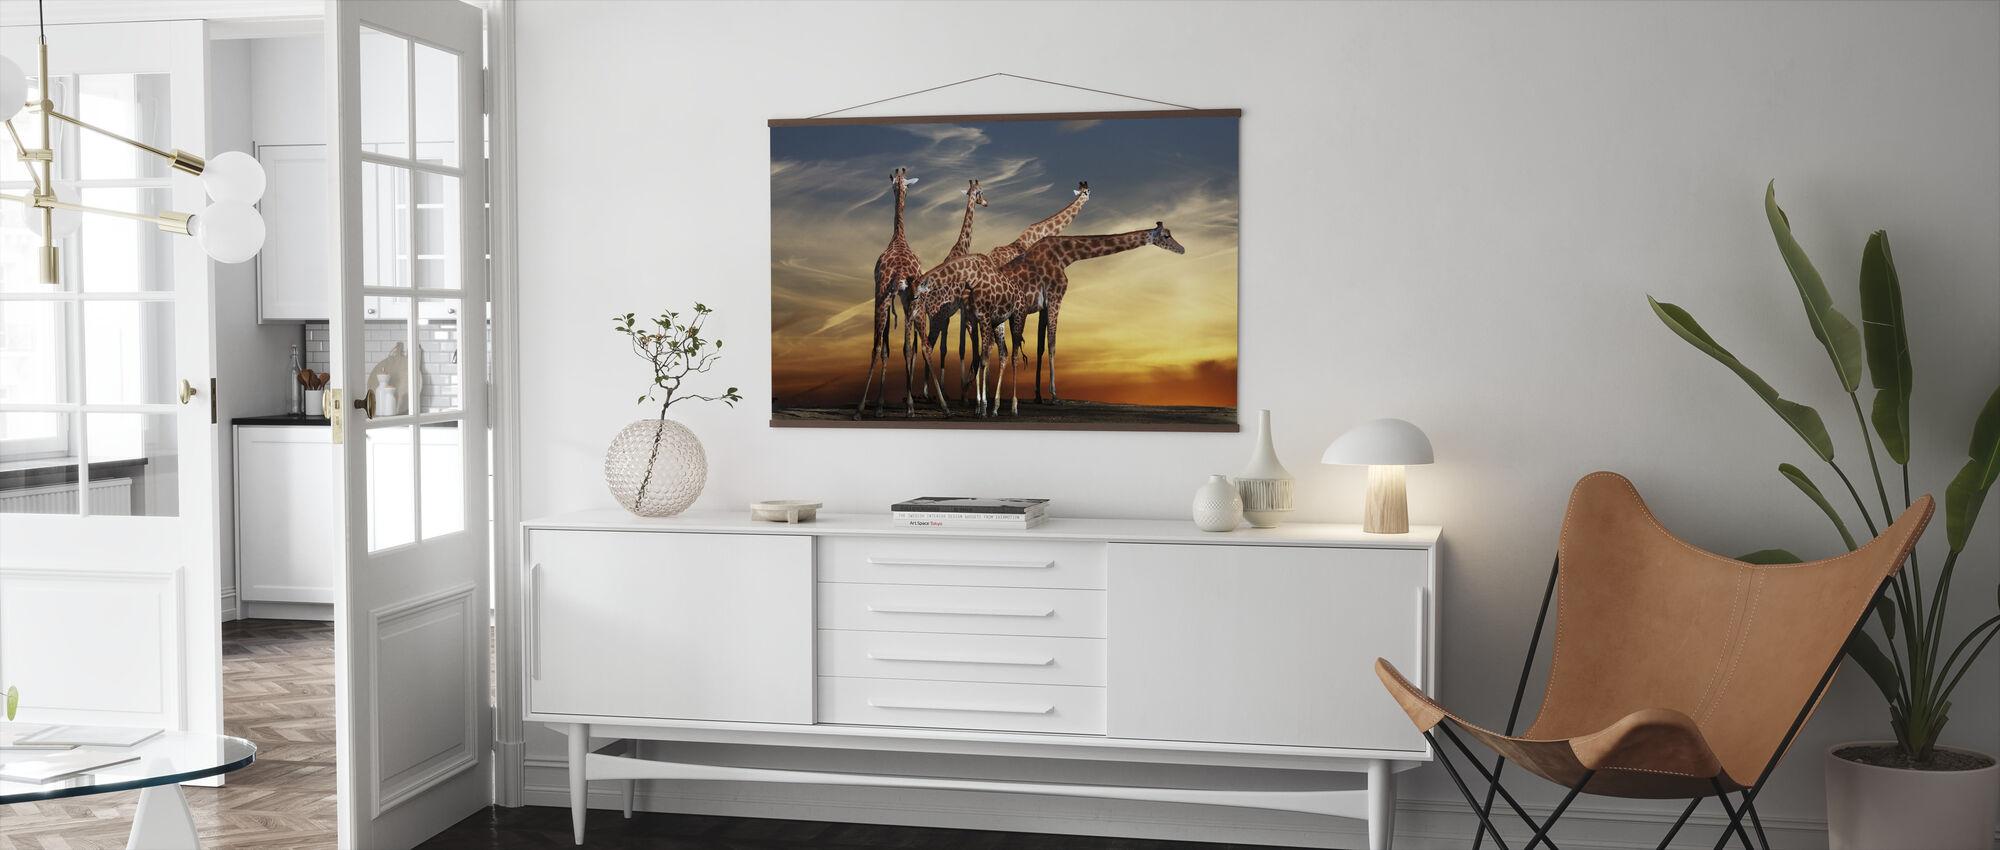 Giraffer och utsikt - Poster - Vardagsrum